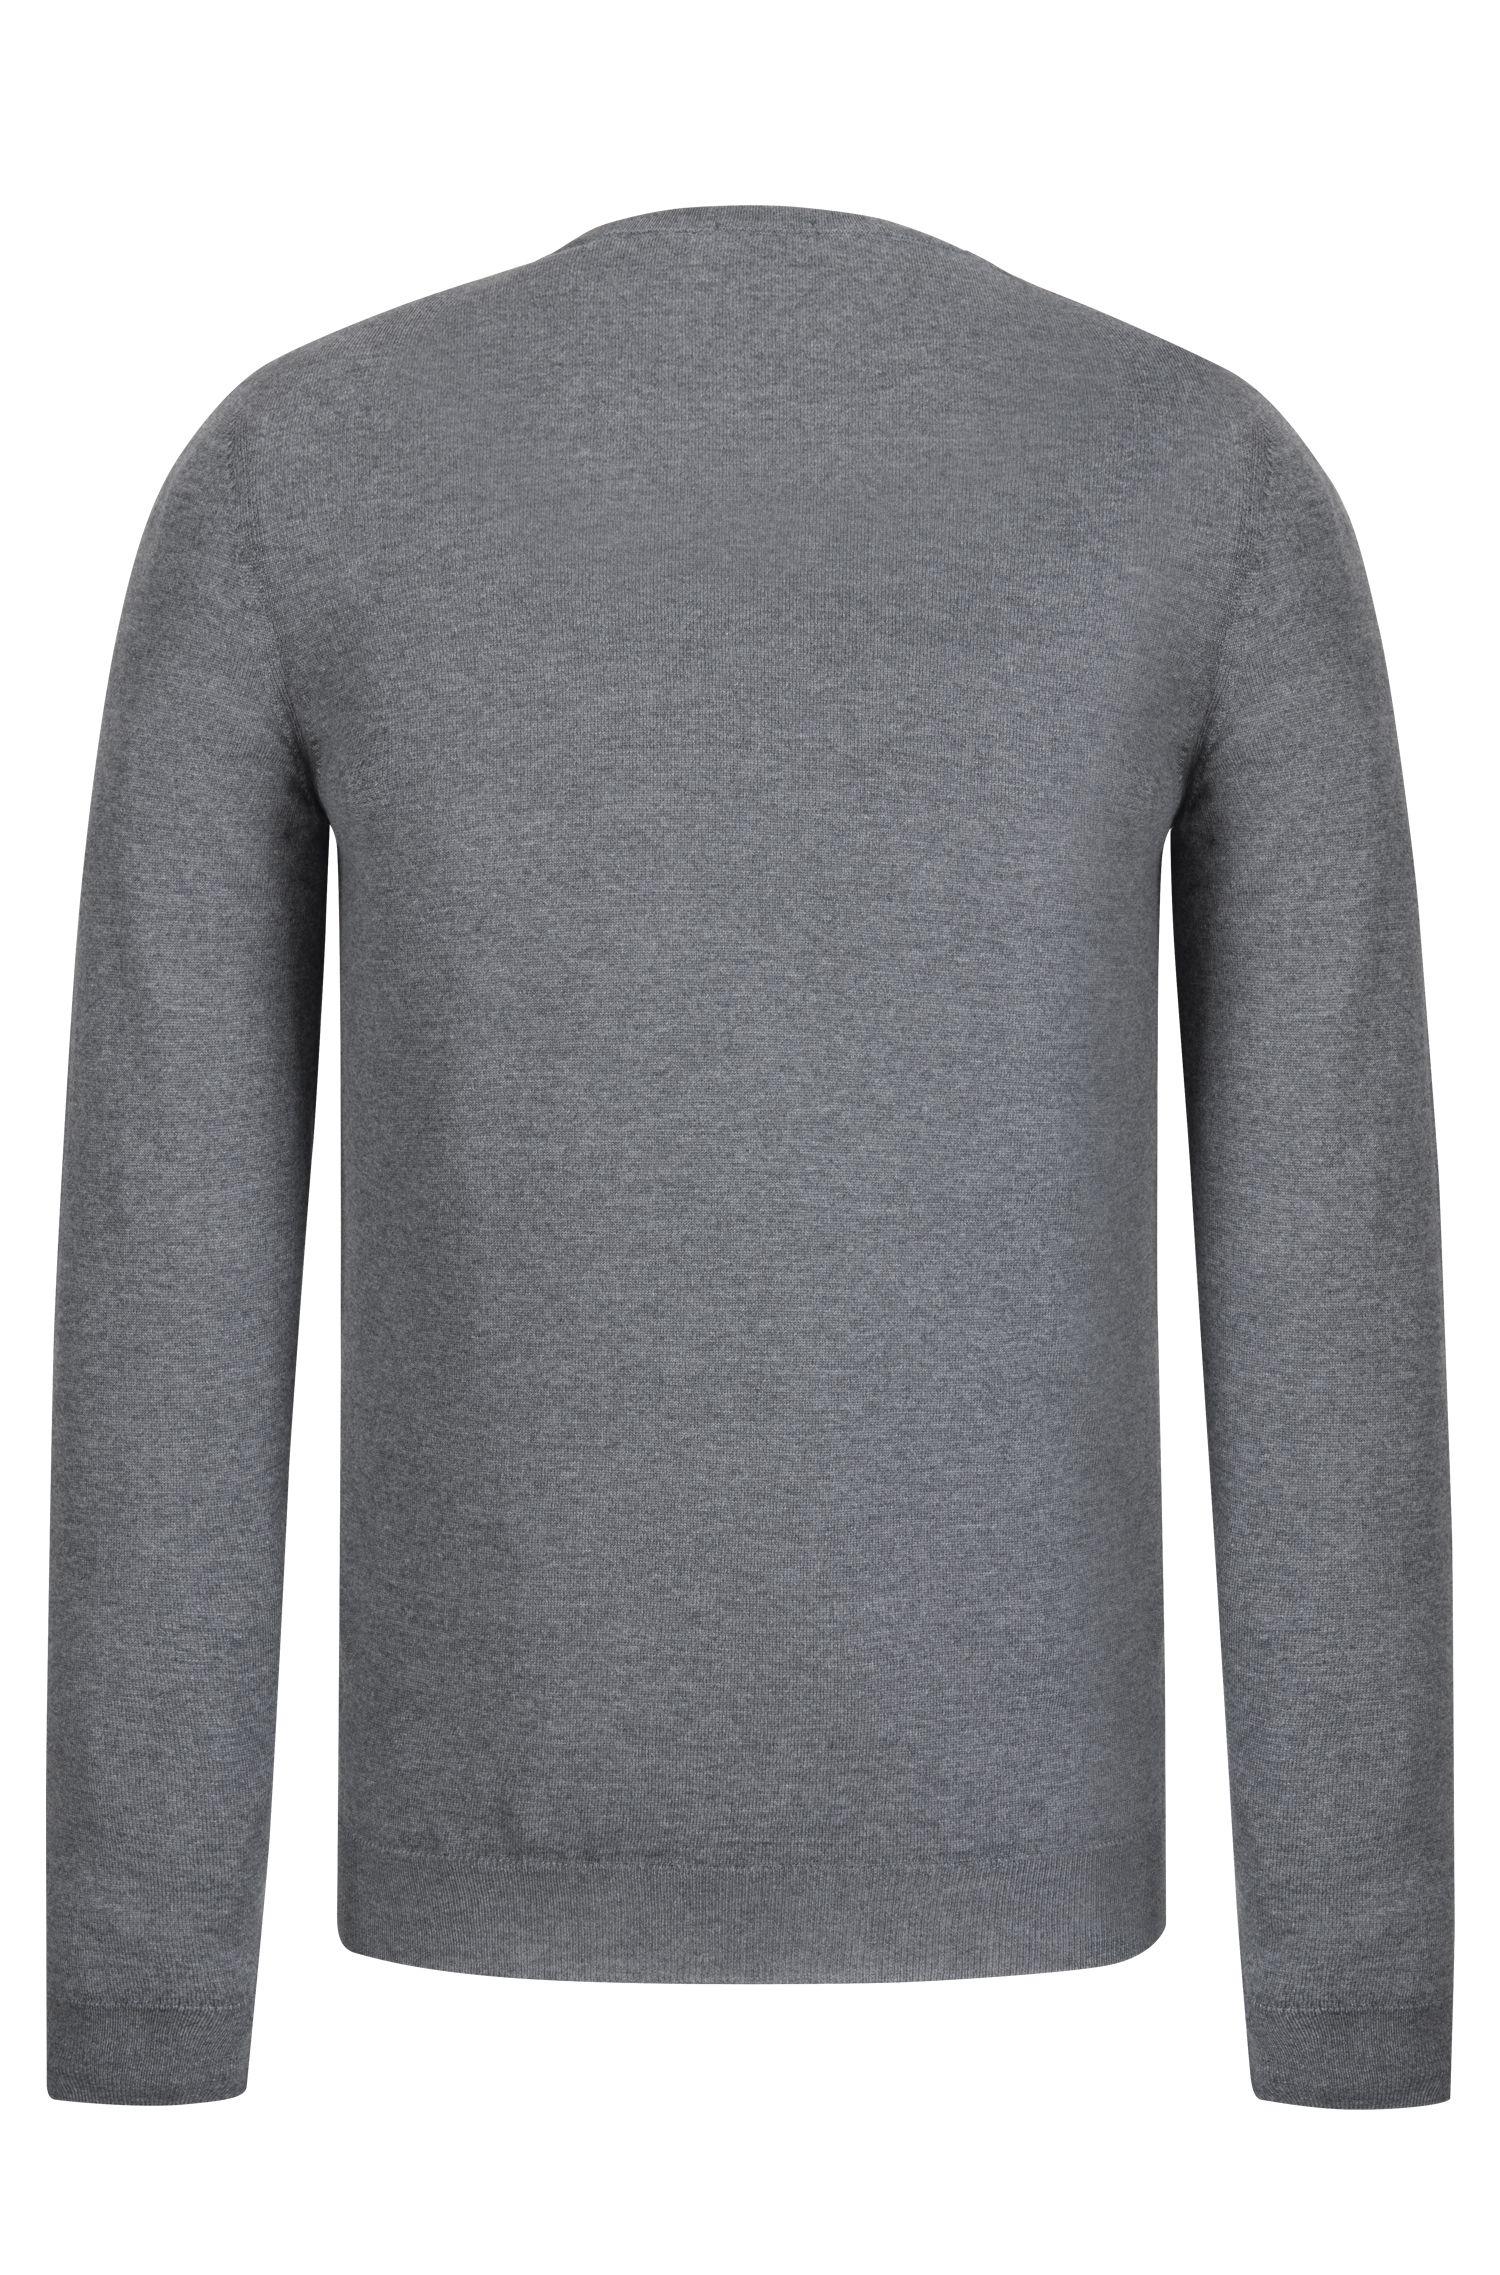 Extra-Fine Merino Wool Sweater   Leno N, Grey